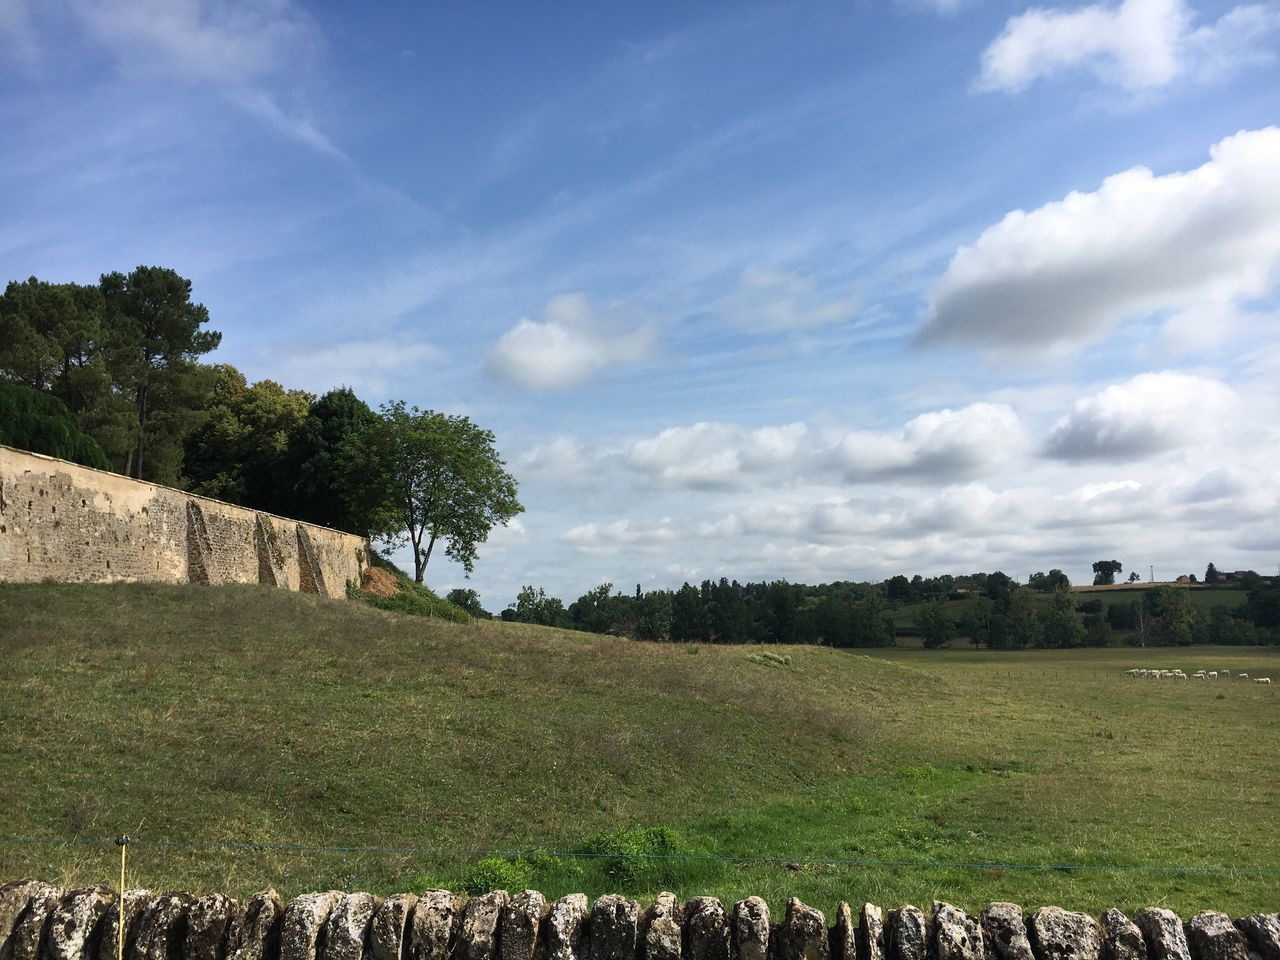 Trees On Grassy Field Against Blue Sky